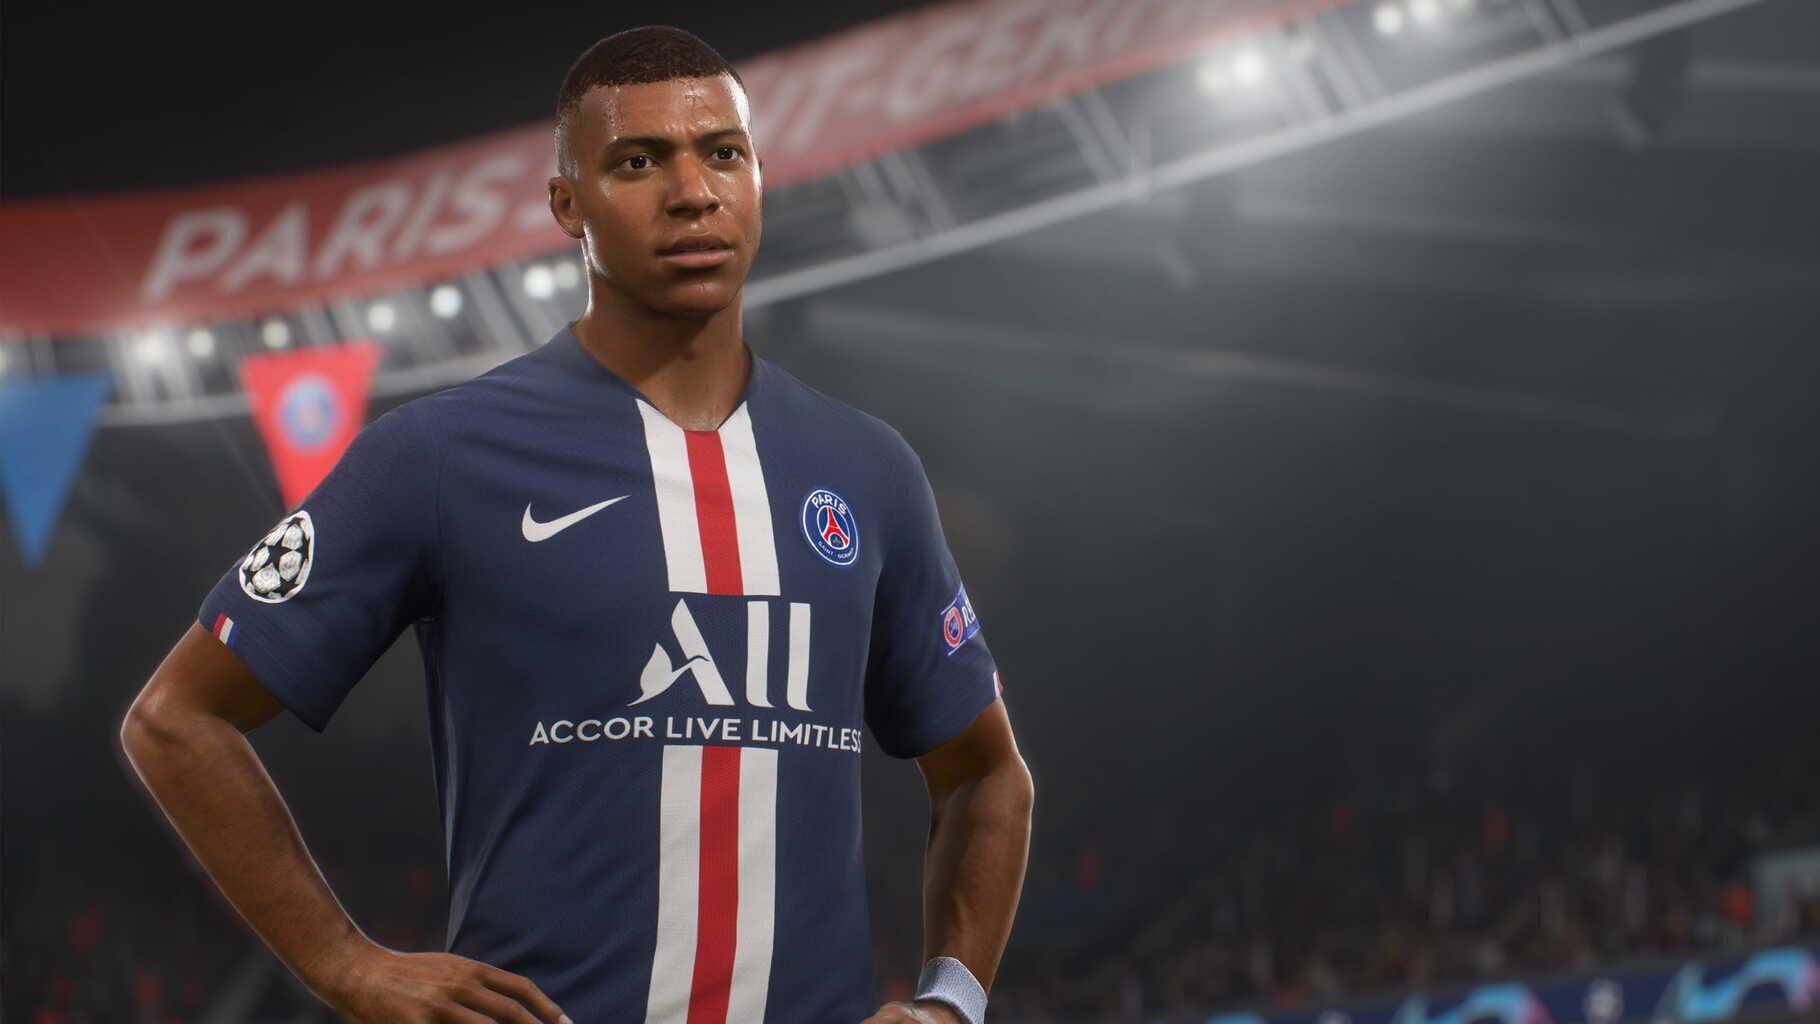 Gameplay Screenshot from FIFA 21